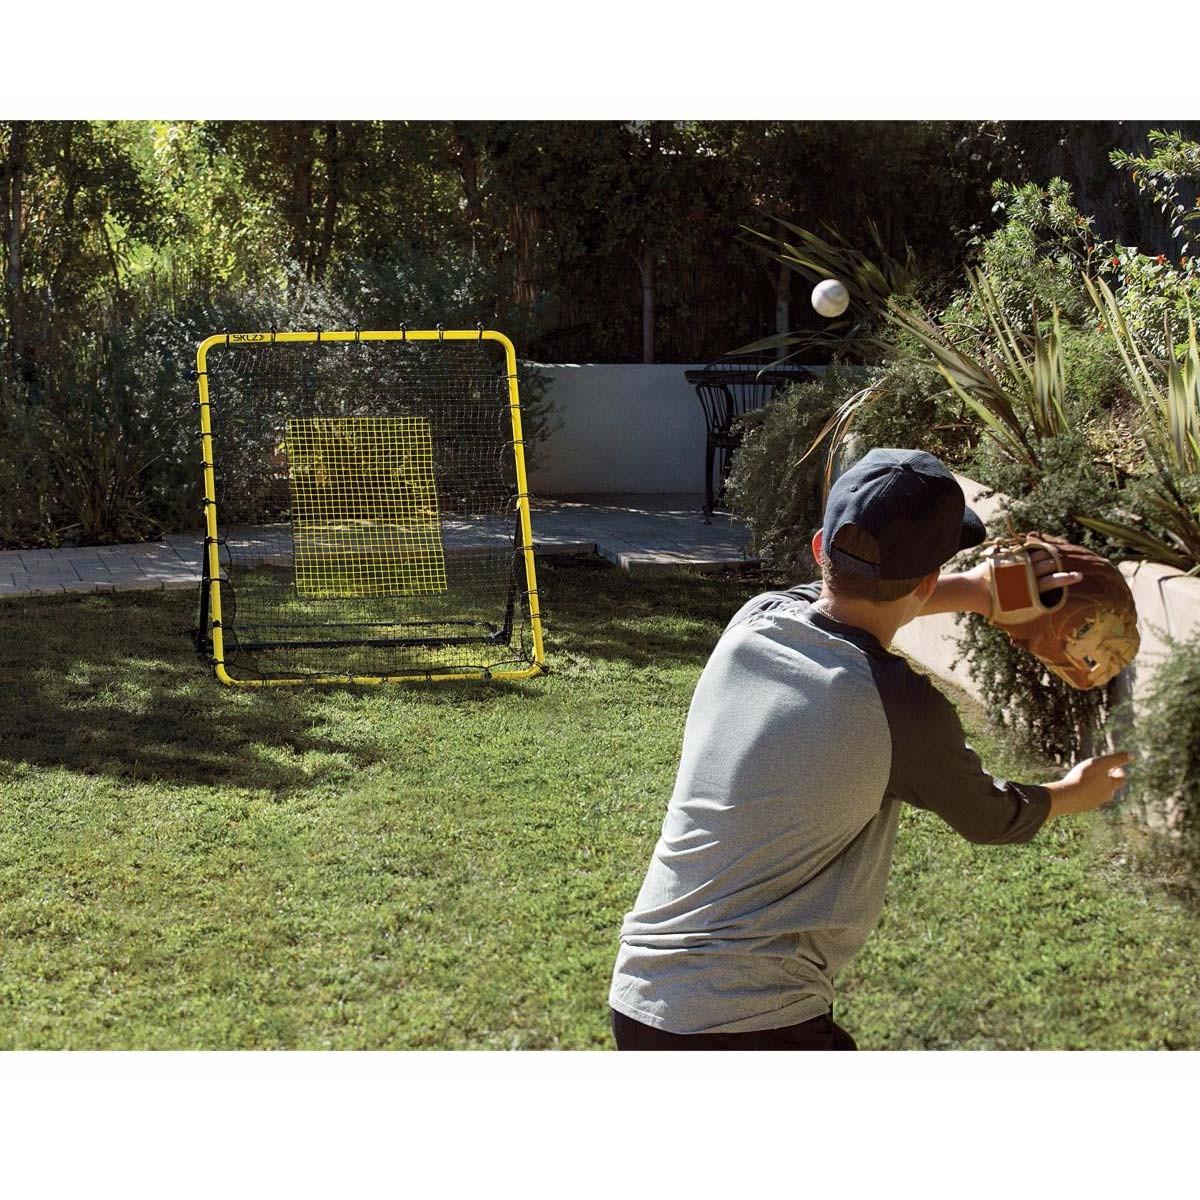 Sklz Baseball Softball Fielding Trainer A32 689